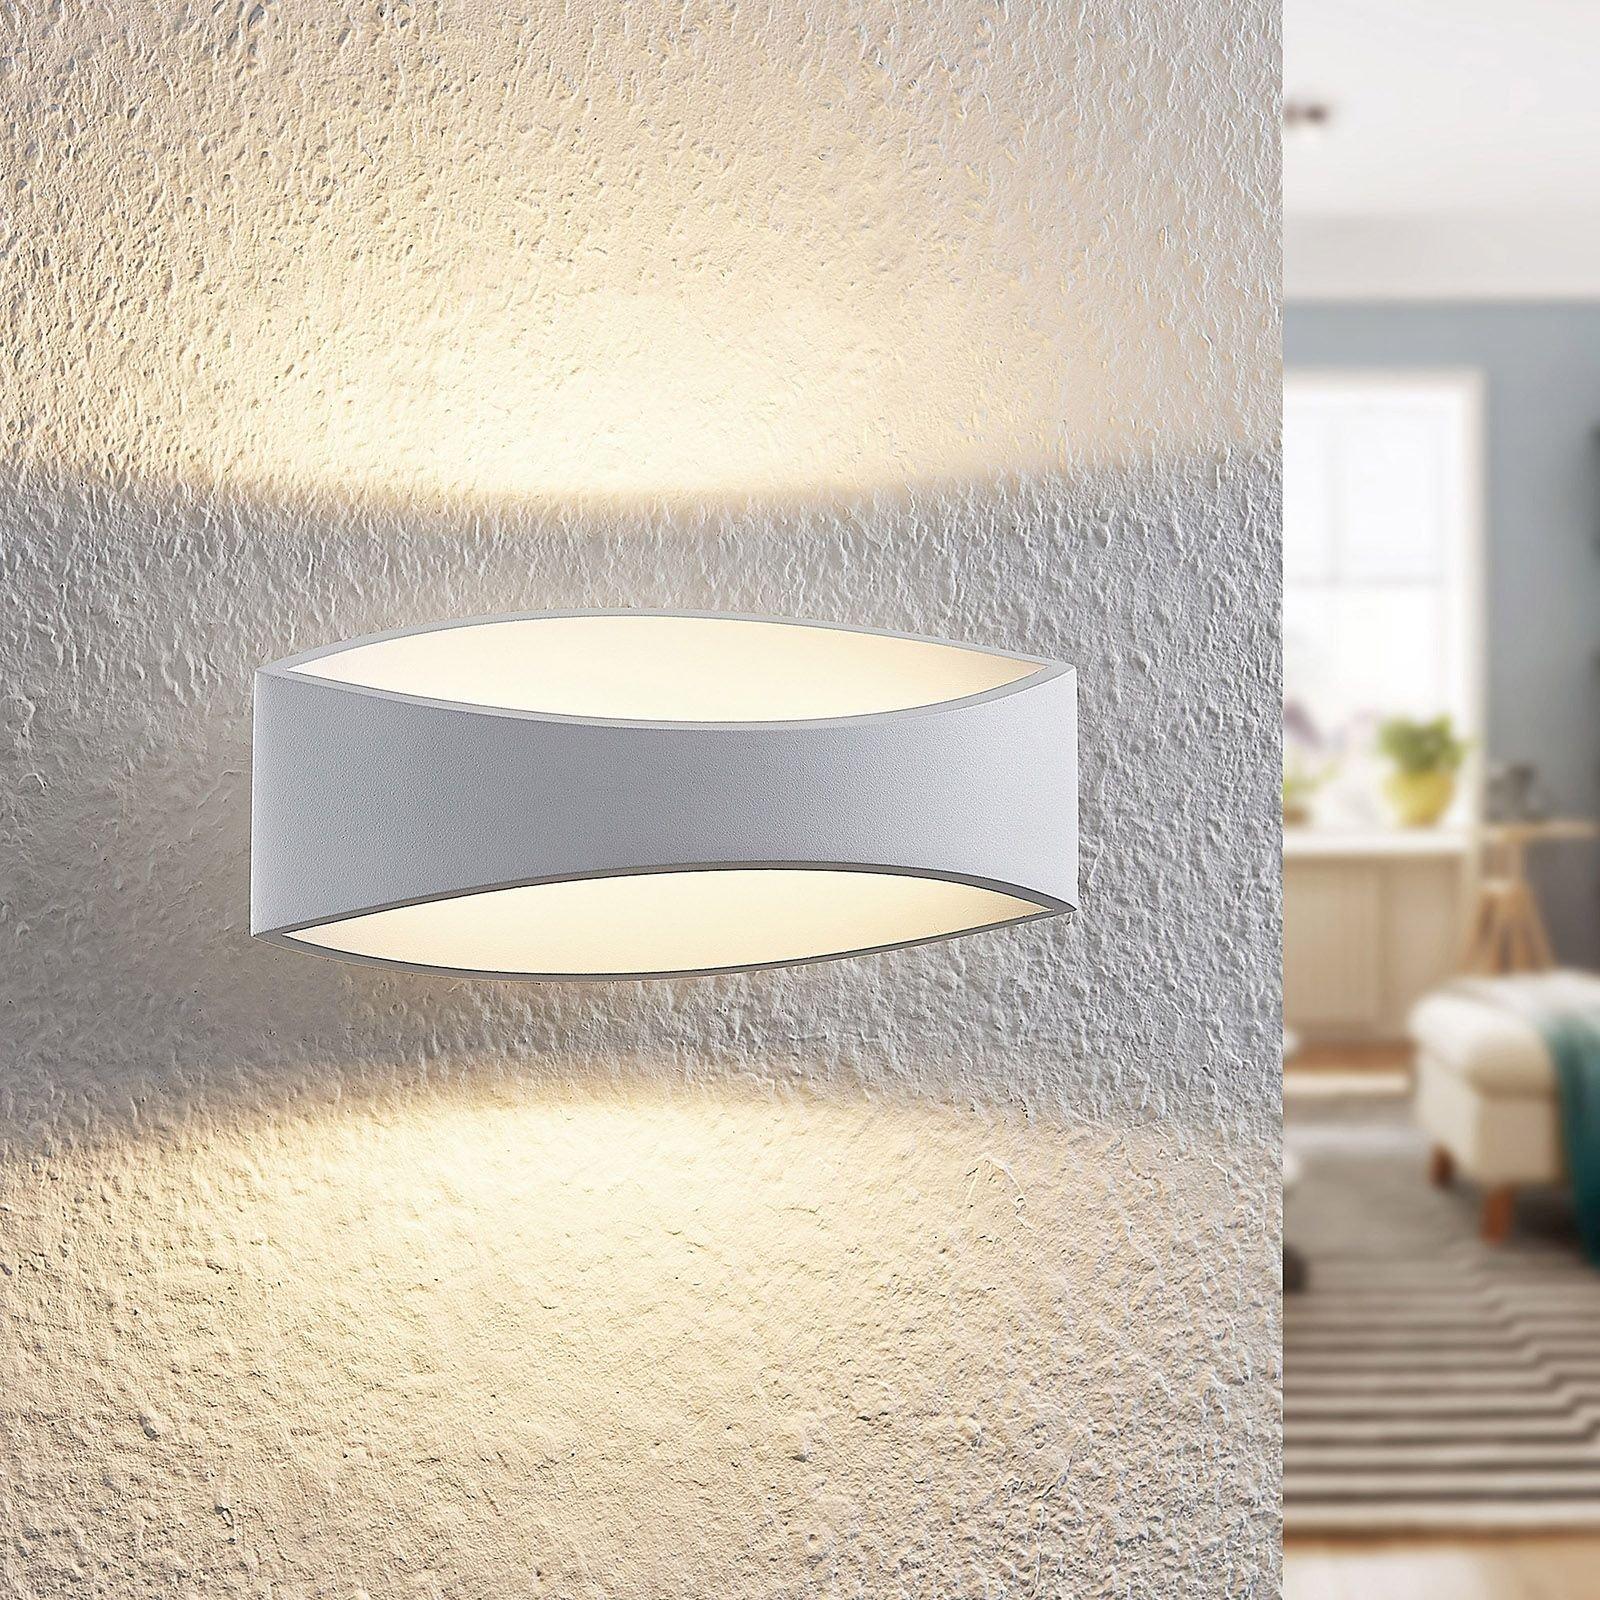 Arcchio Jelle LED-vegglampe, 25 cm, hvit